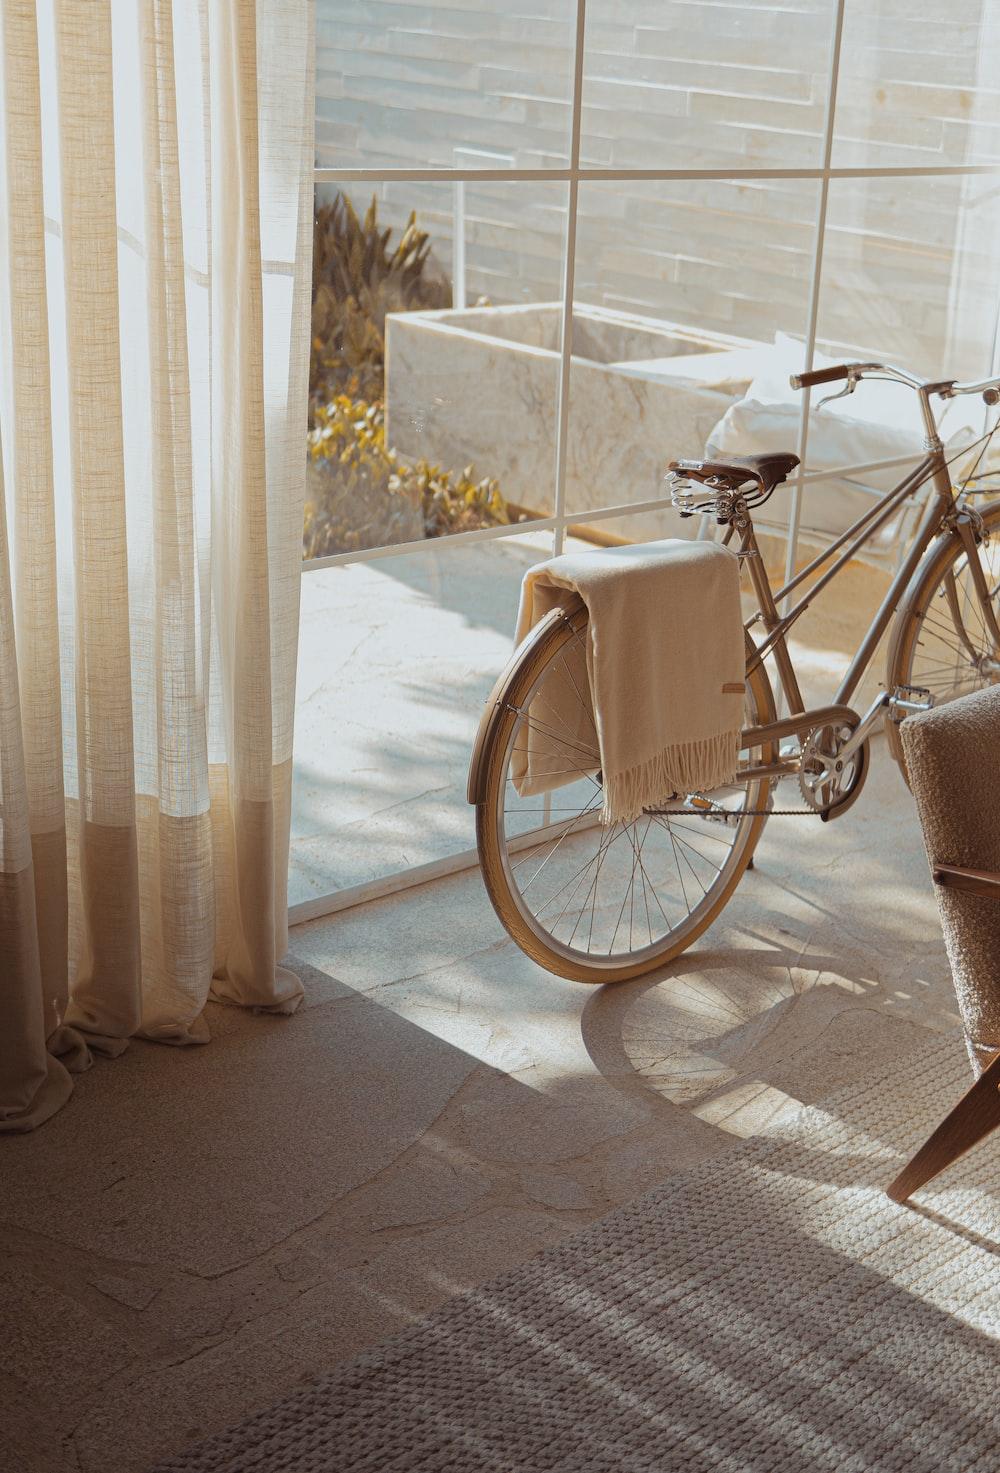 white bike near glass wall